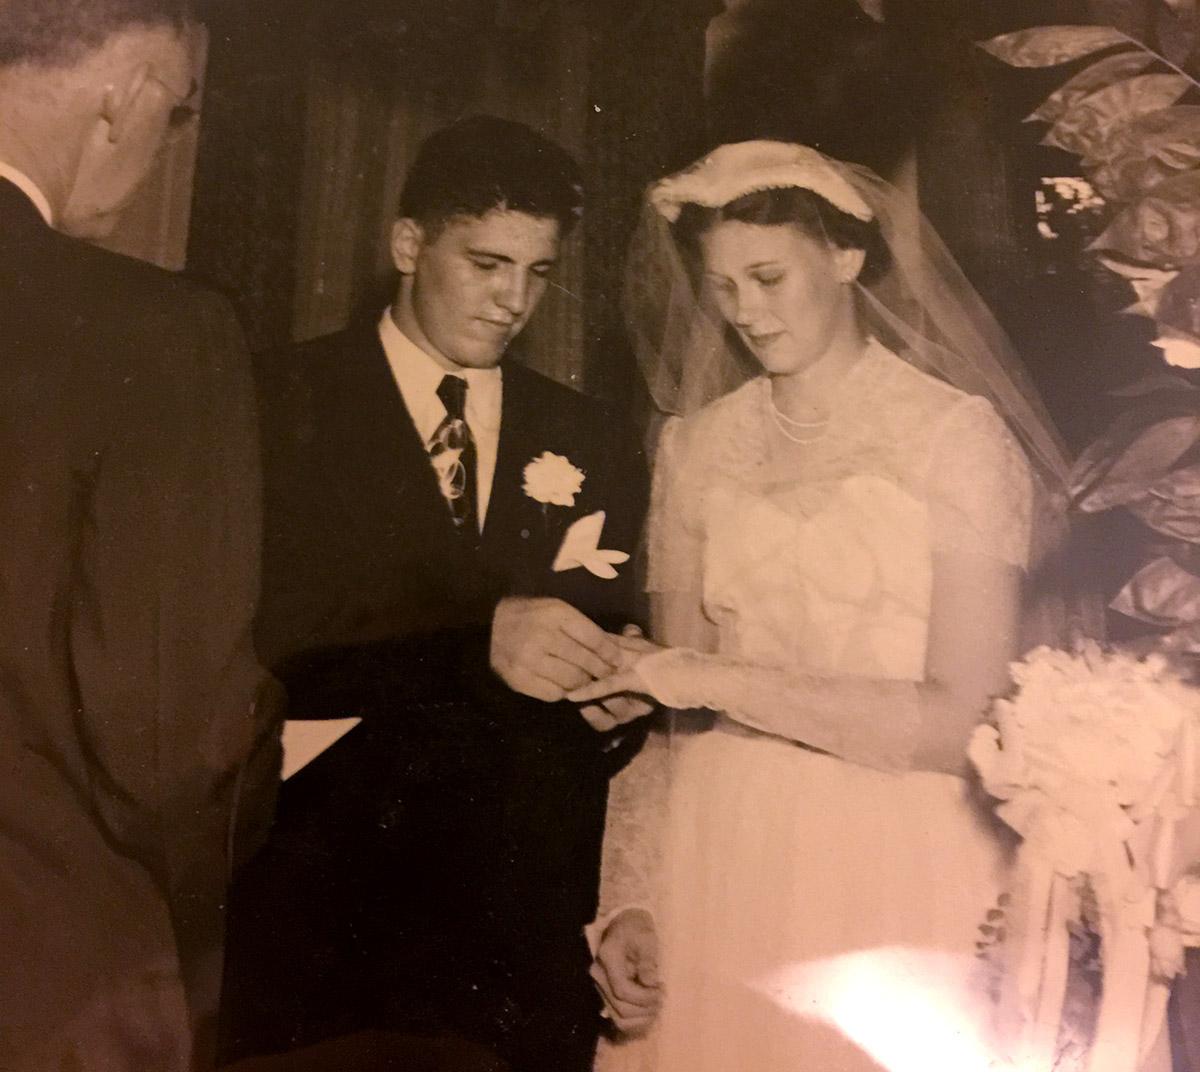 Grandpa and Grandma, on their wedding day